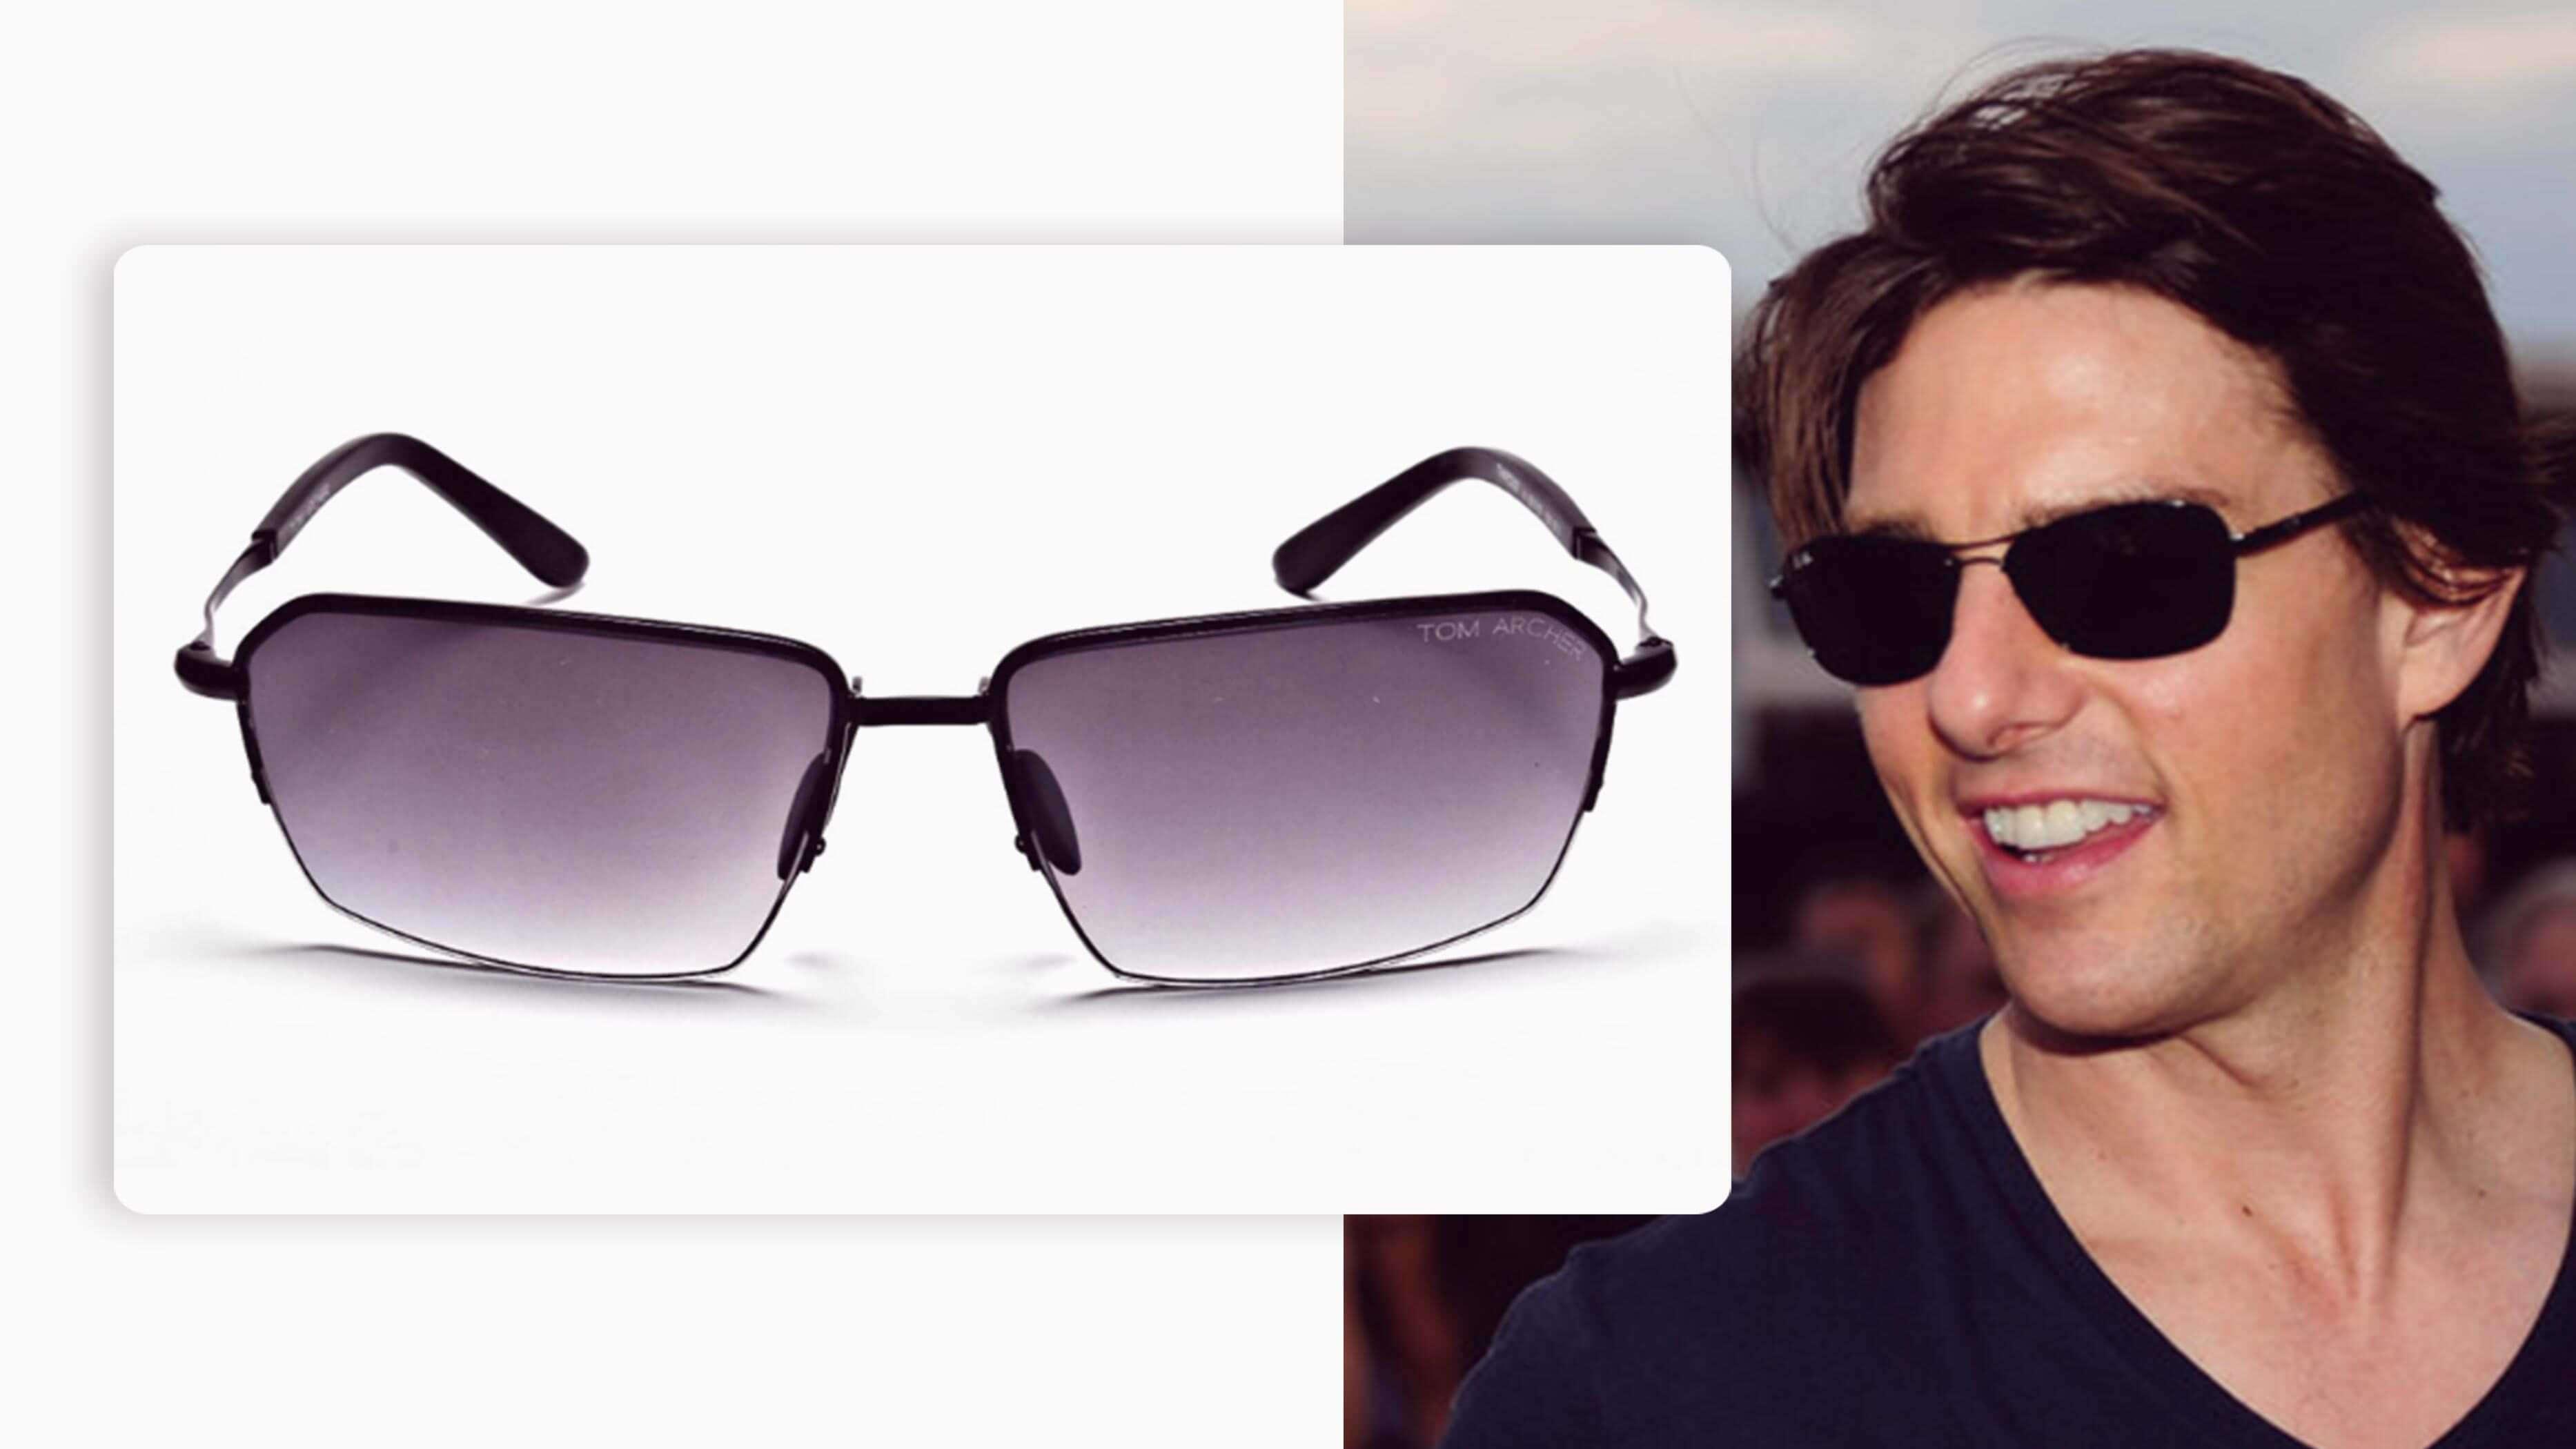 rectangular pair of black sunglasses with grey tints